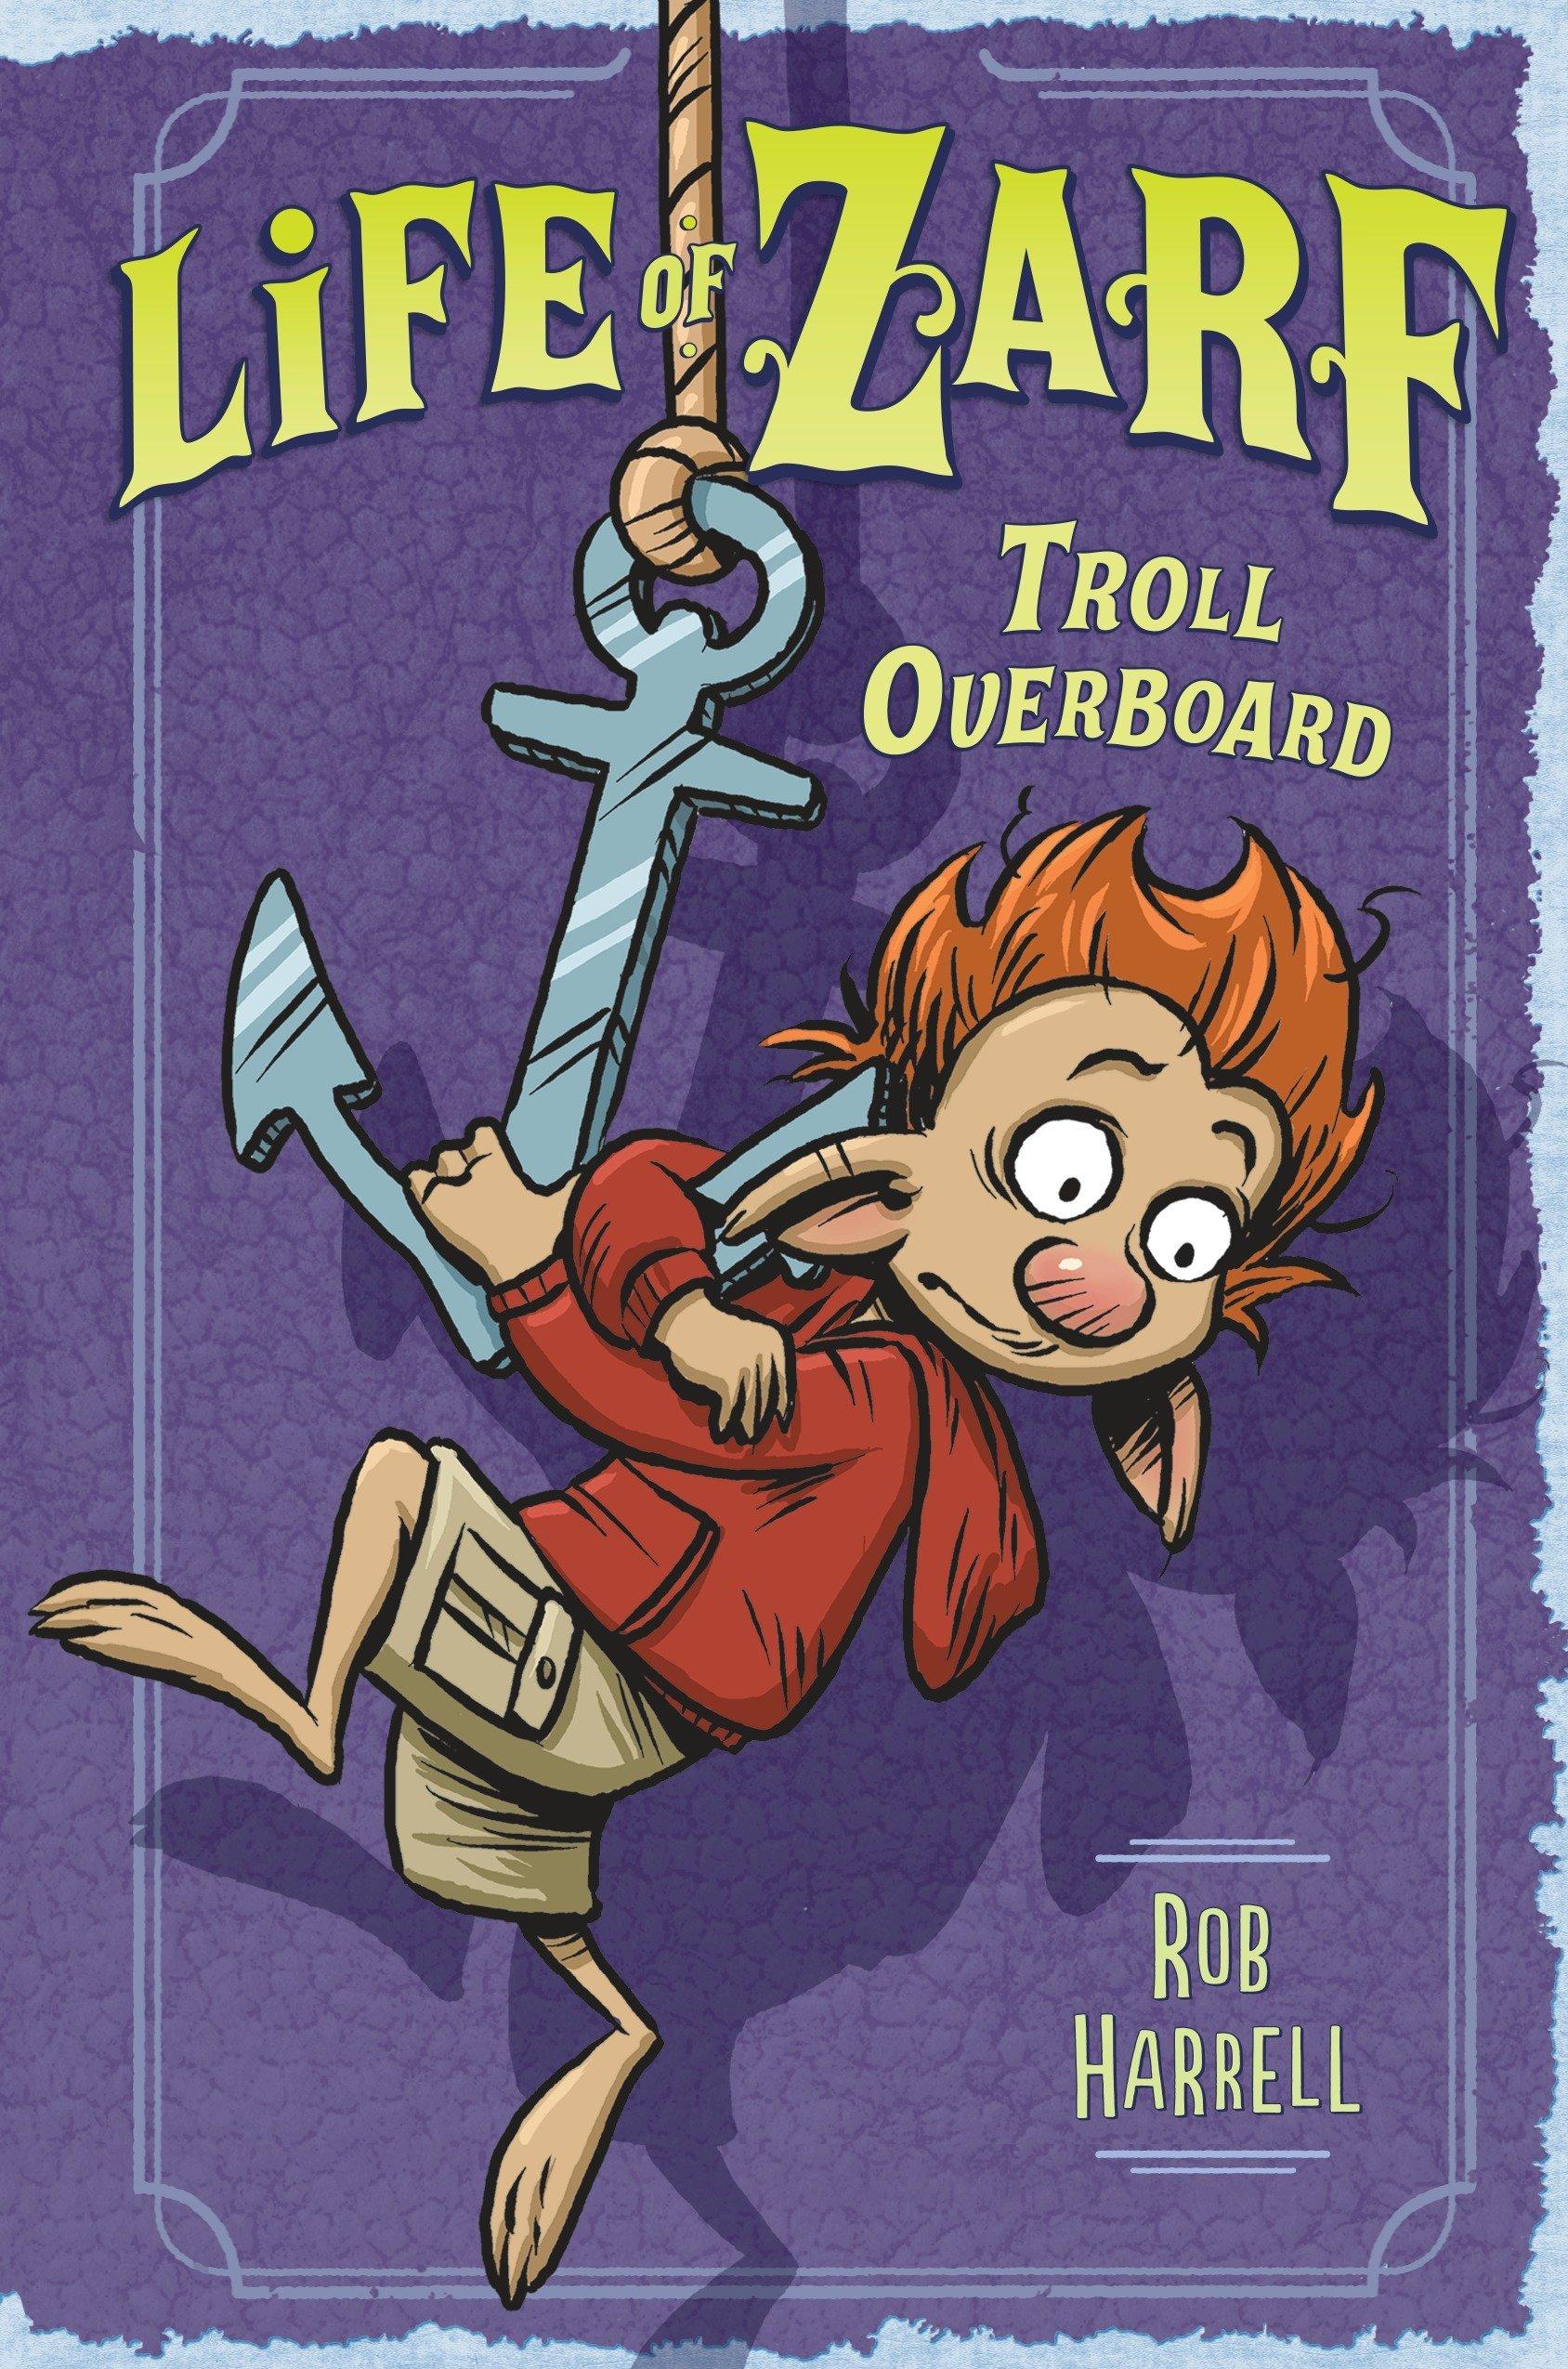 Life of Zarf: Troll Overboard ebook